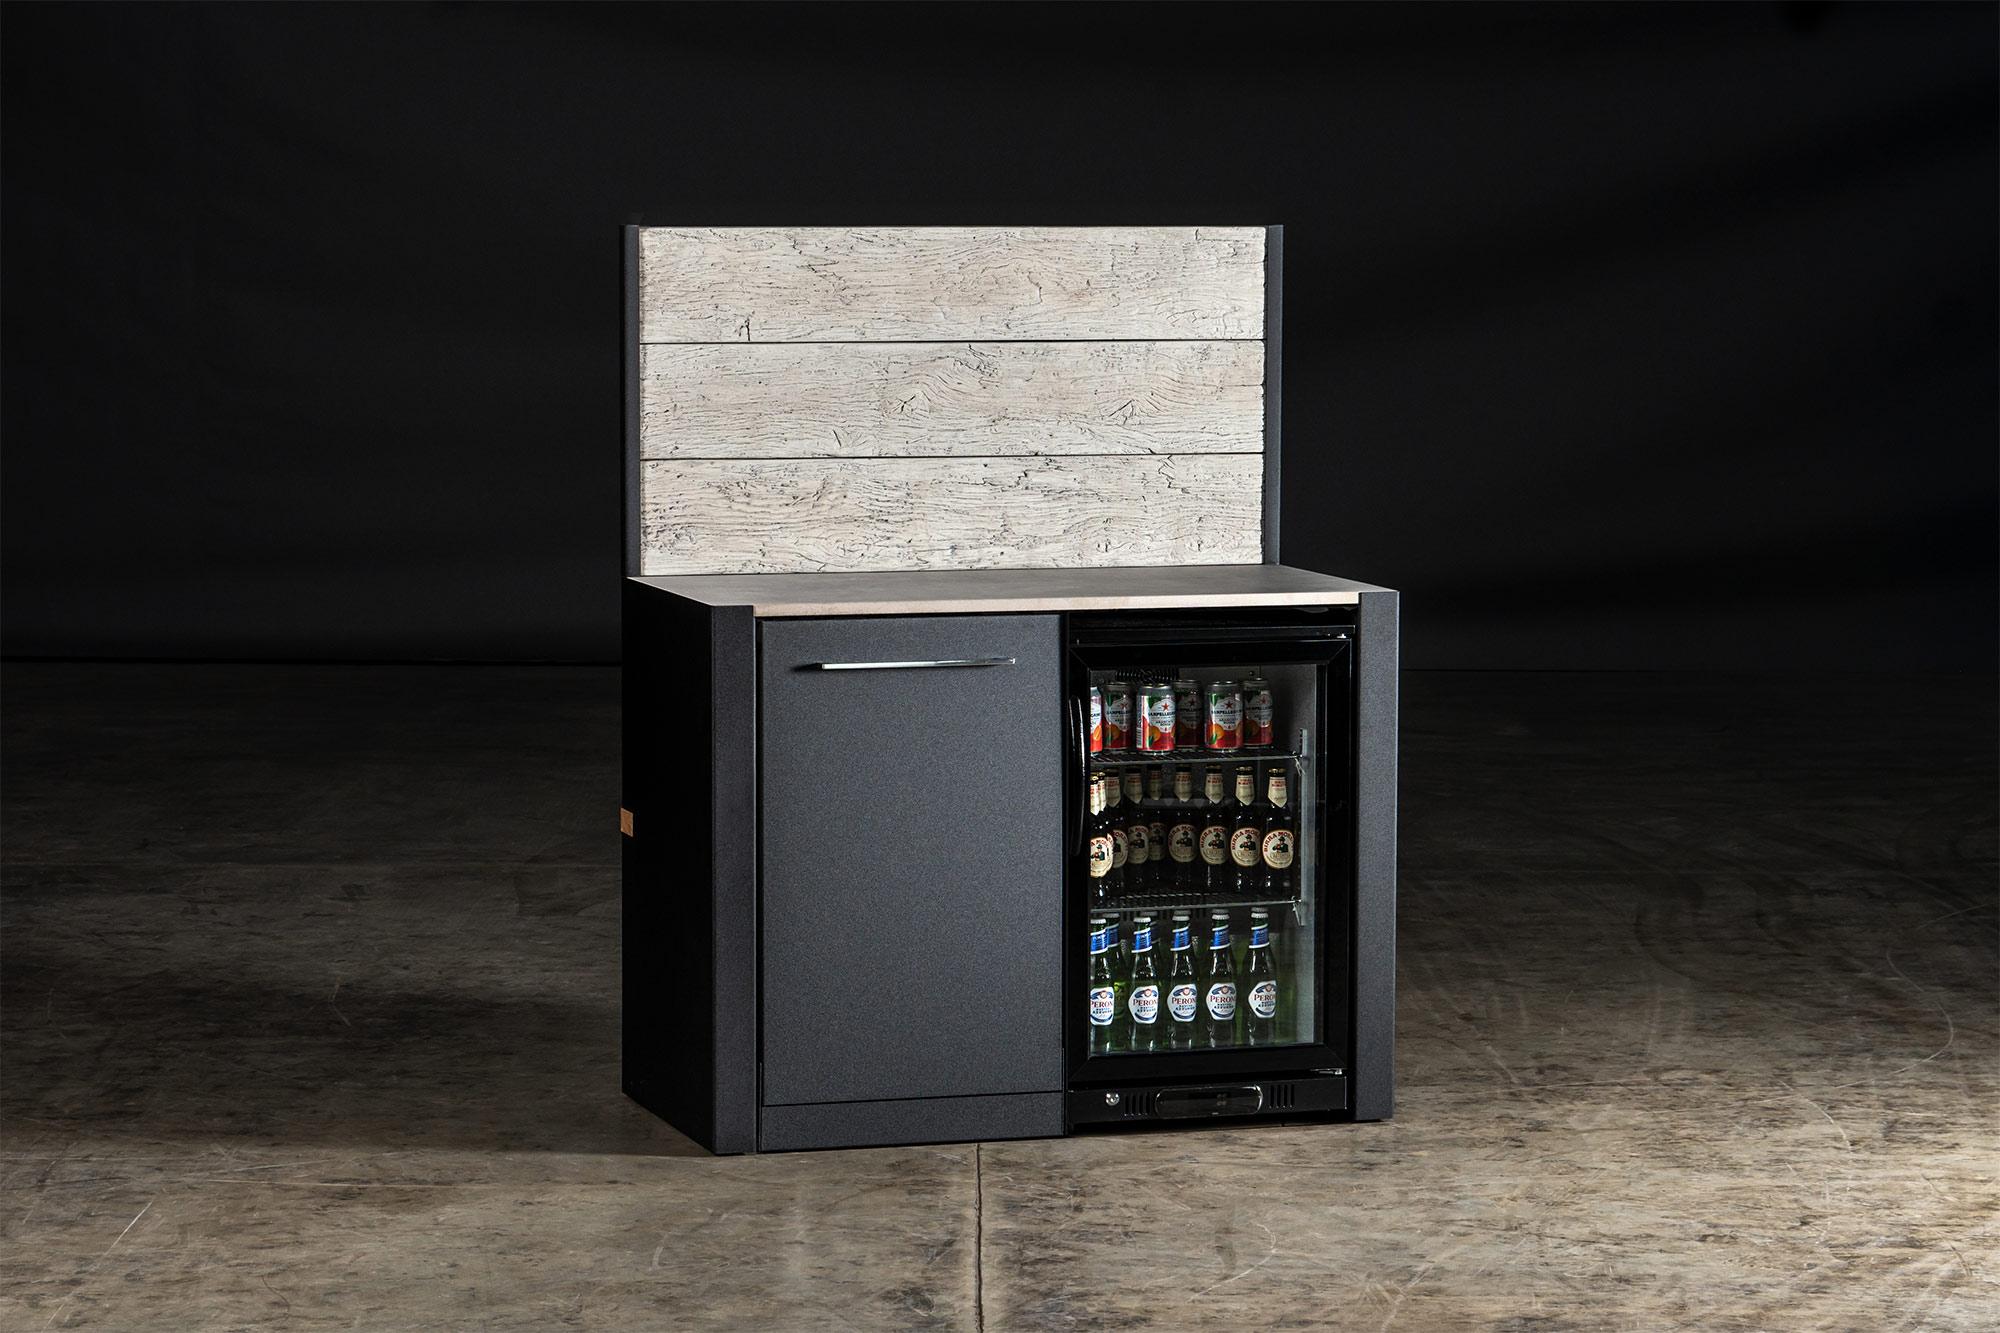 Vantage-Kitchen-Fridge-Cabinet-Driftwood-Millboard-Feature-Wall NEW.jpg